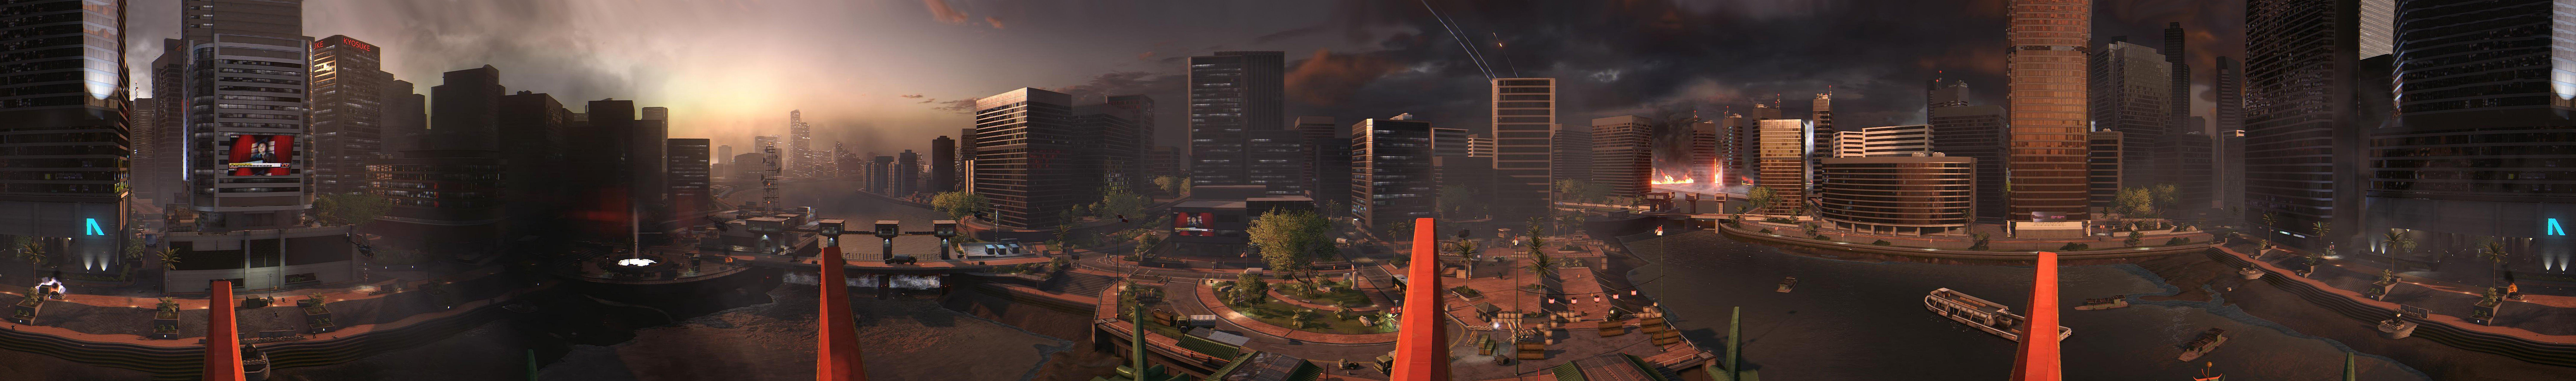 Battlefield 4 Dragon's Teeth в широком формате (панорама) - Изображение 4